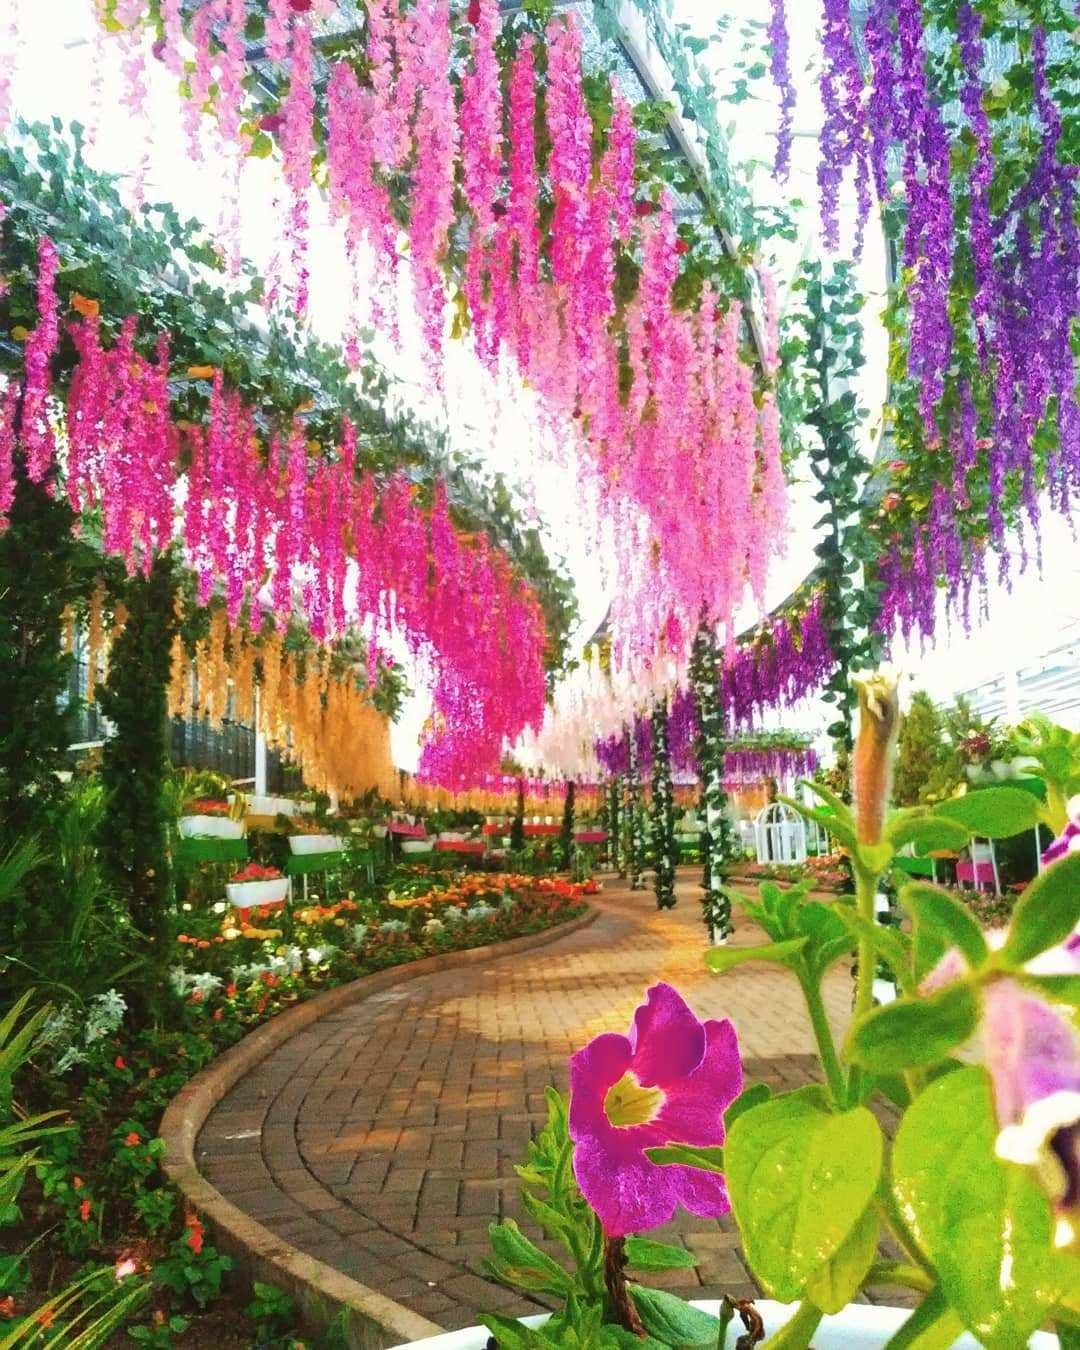 Warna warni bunga di wisata Florawisata San Terra Malang Image From @florawisata.santerra